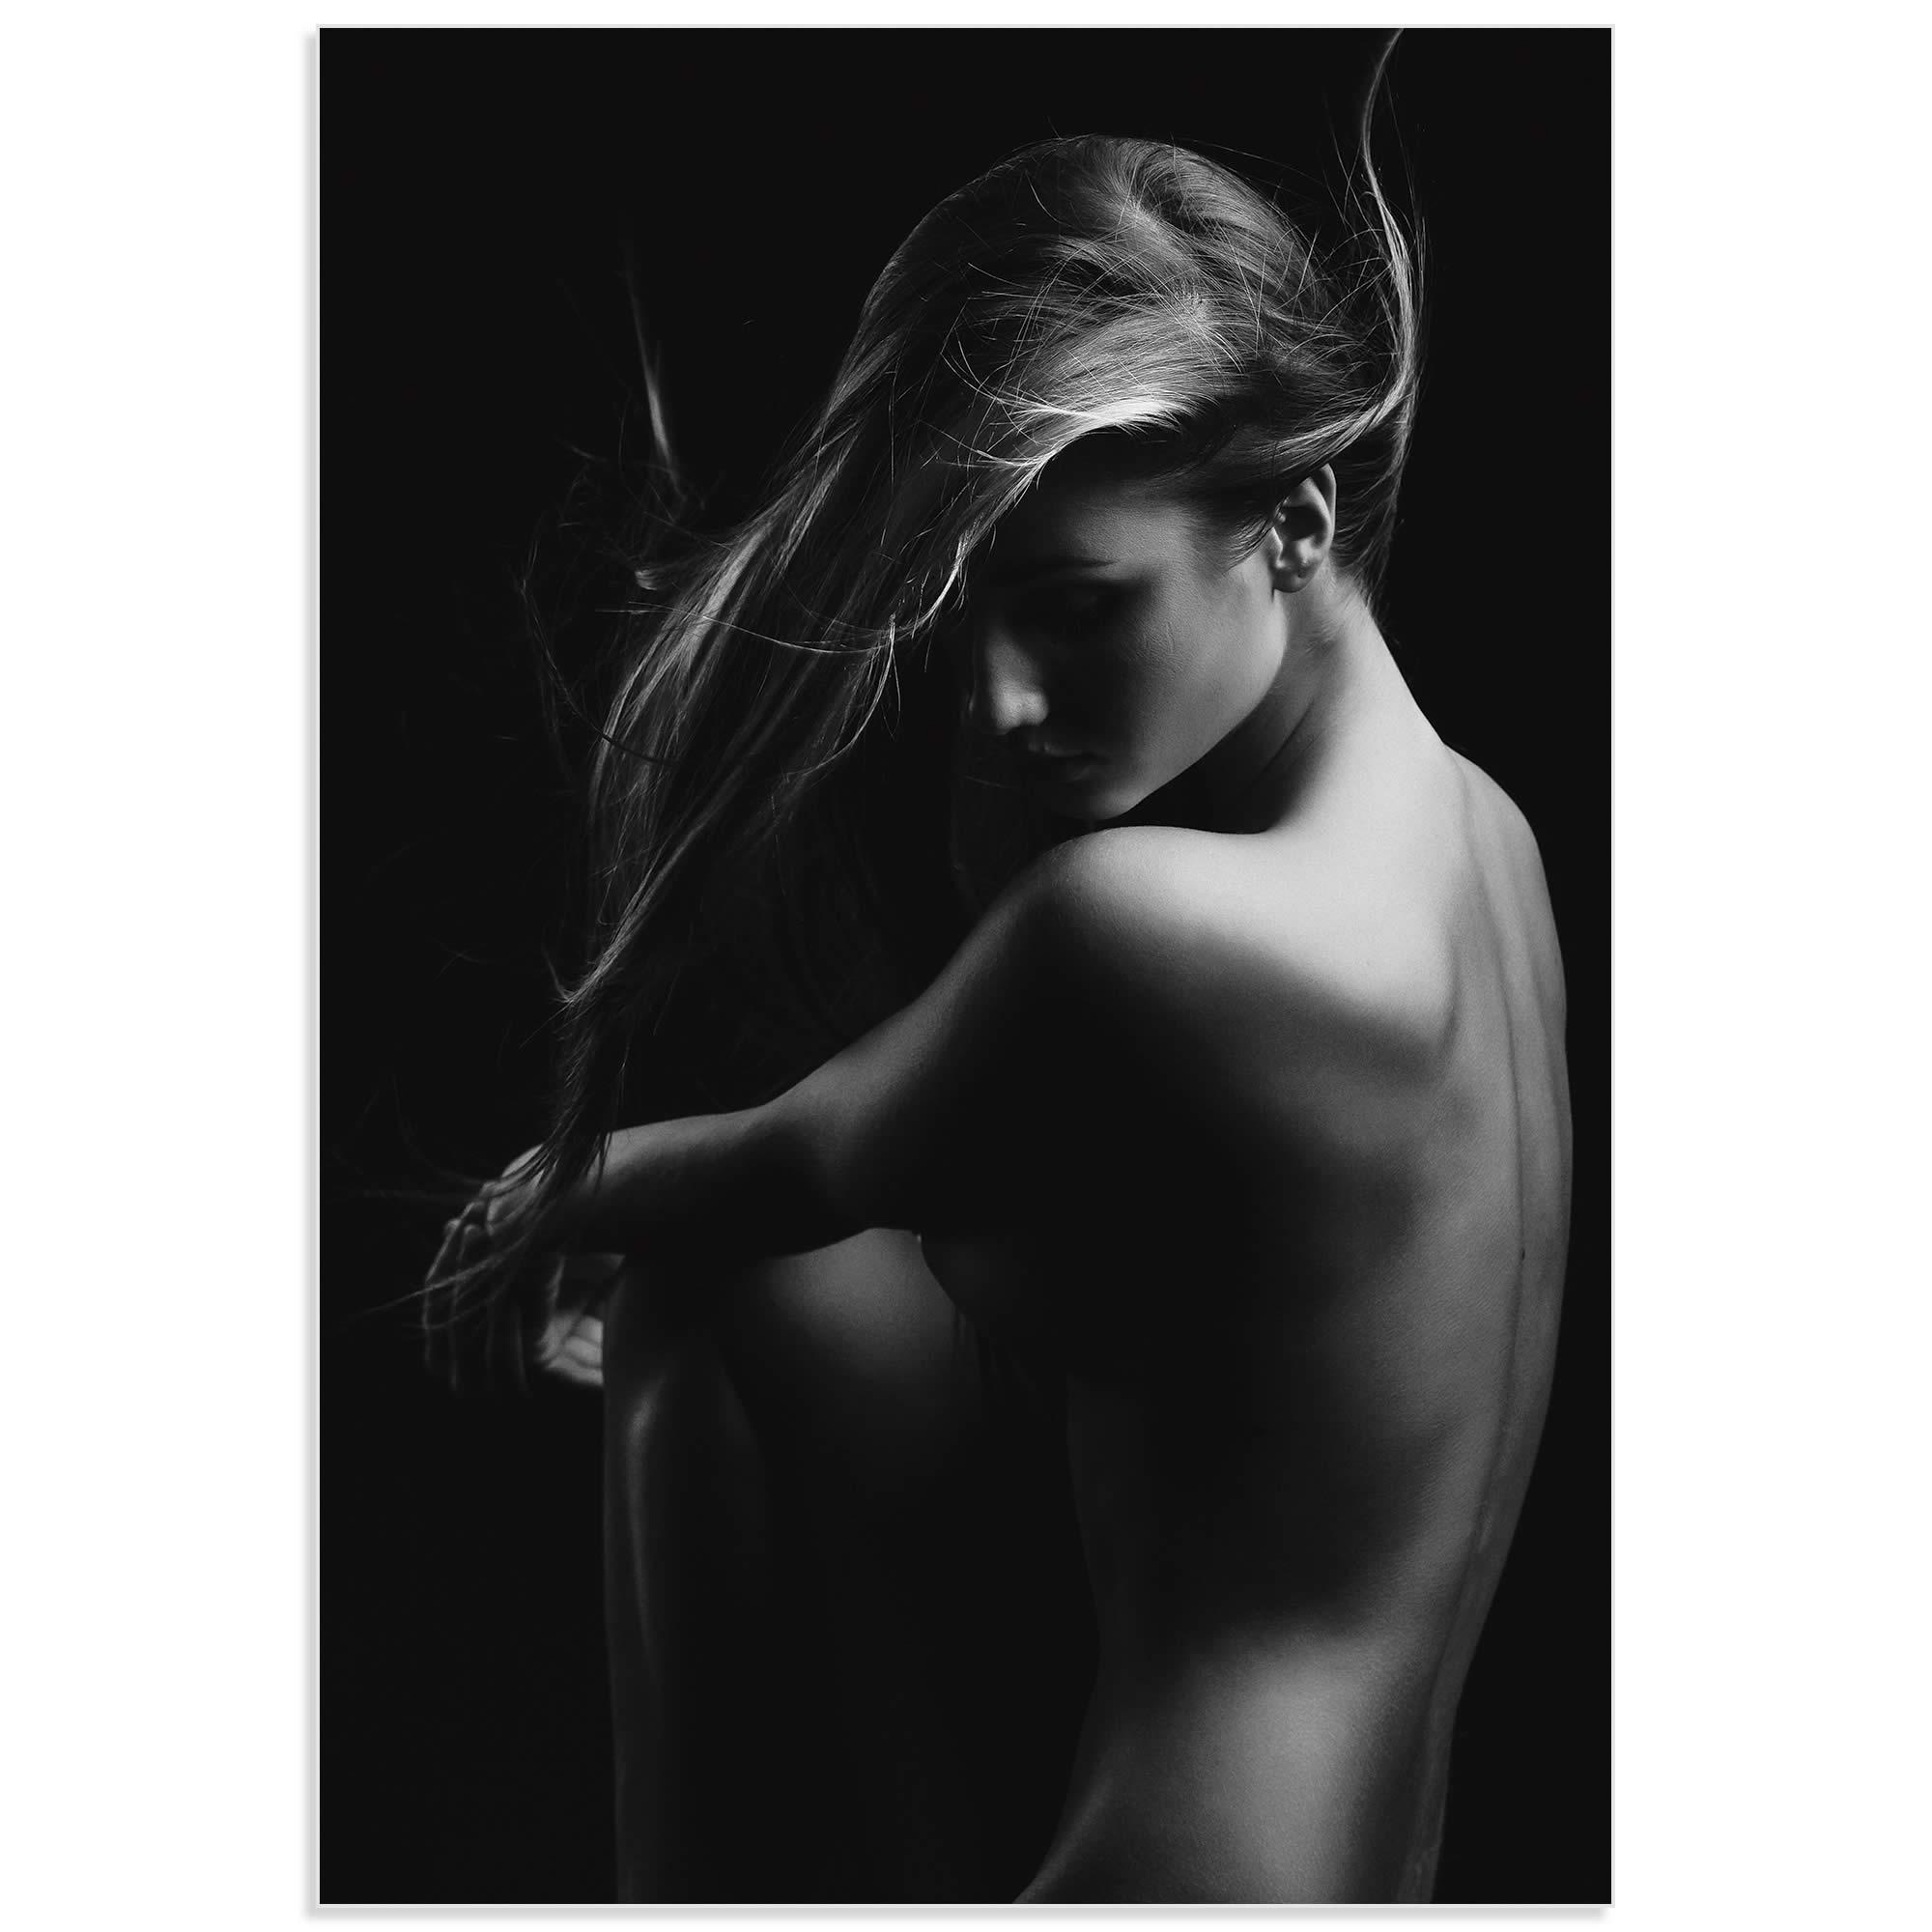 Sensual Beauty by Martin Krystynek - Model Photography on Metal or Acrylic - Alternate View 2